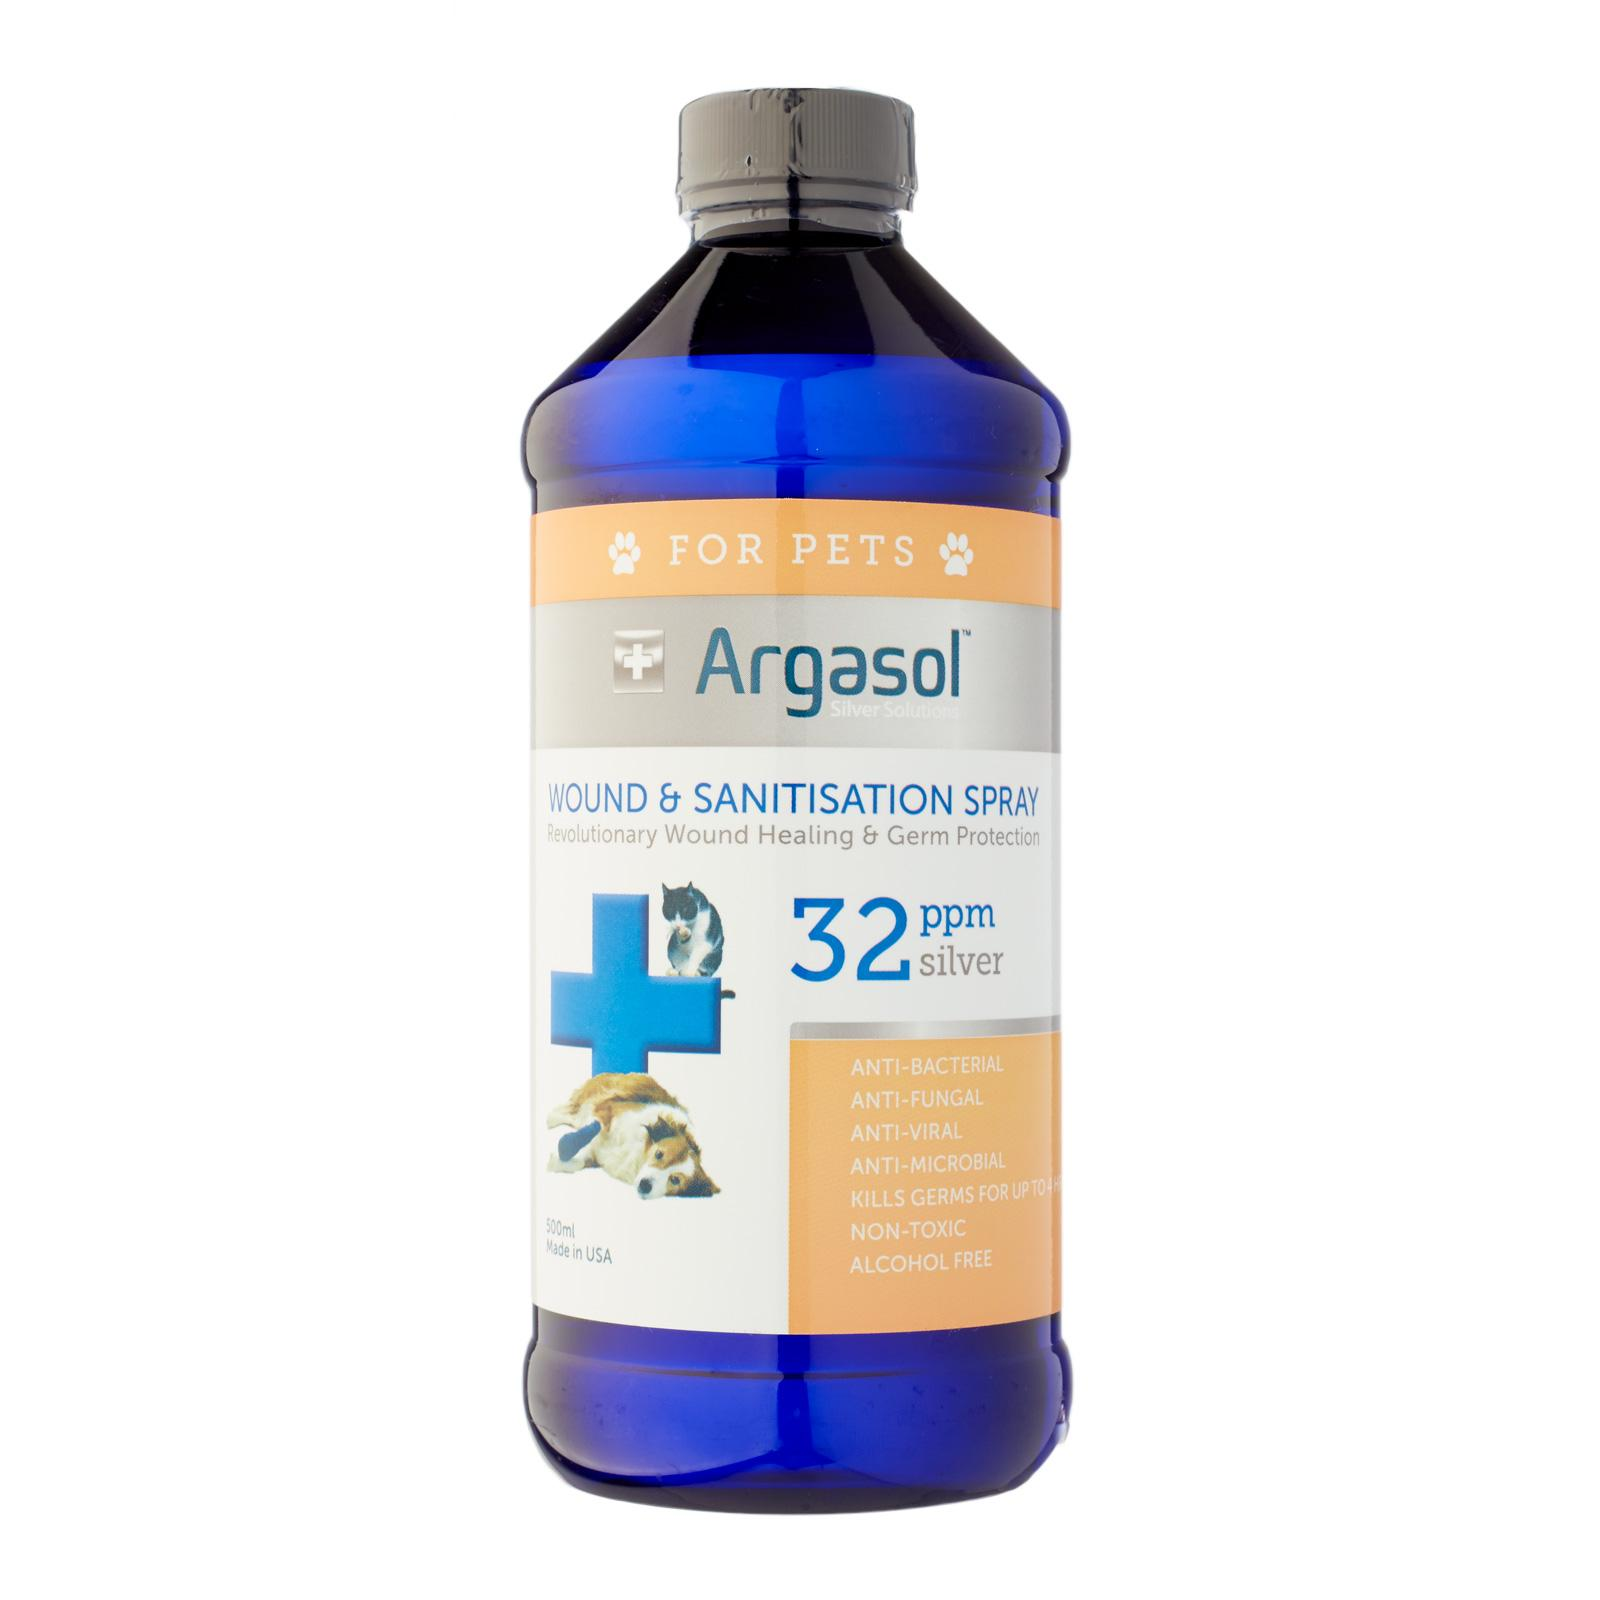 Argasol Pets Silver Spray 32 PPM